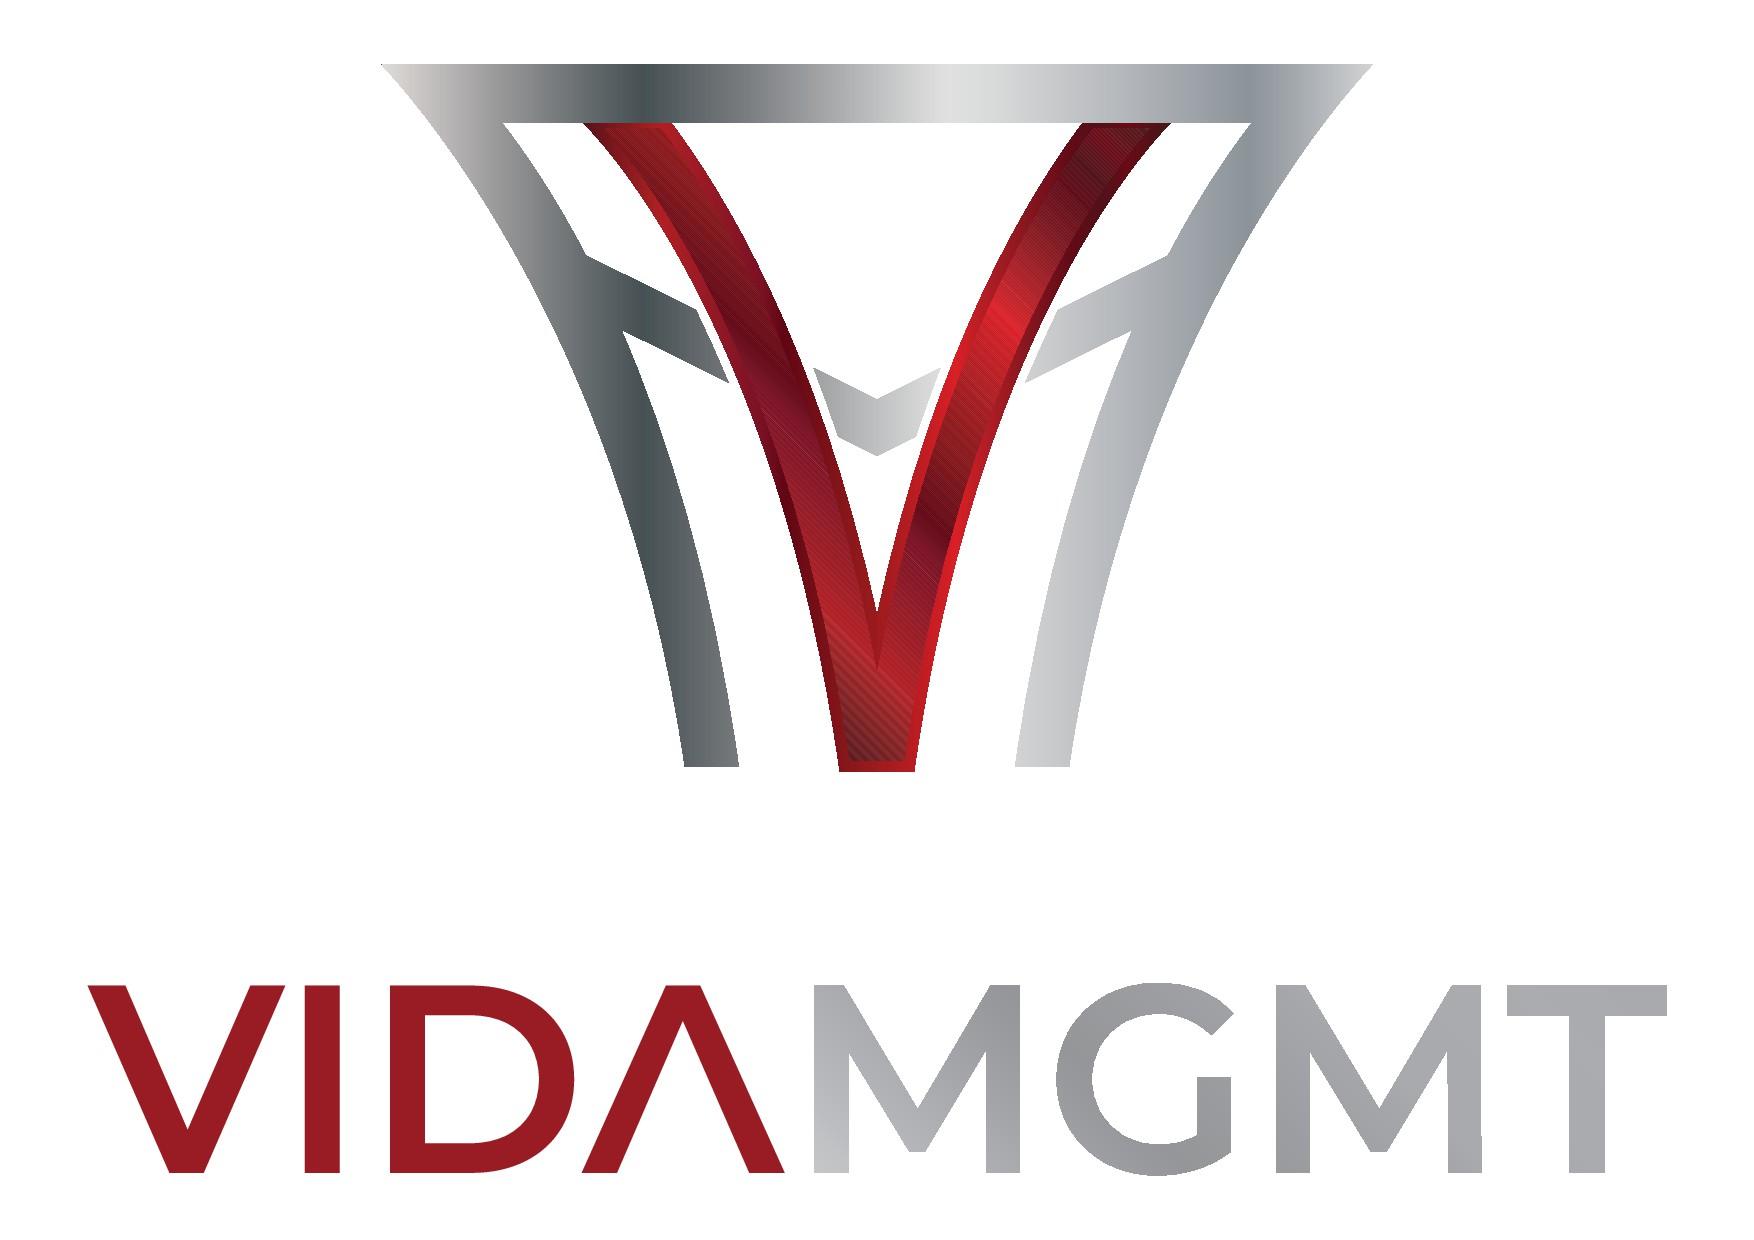 Basketball agency logo needed...creativity encouraged!